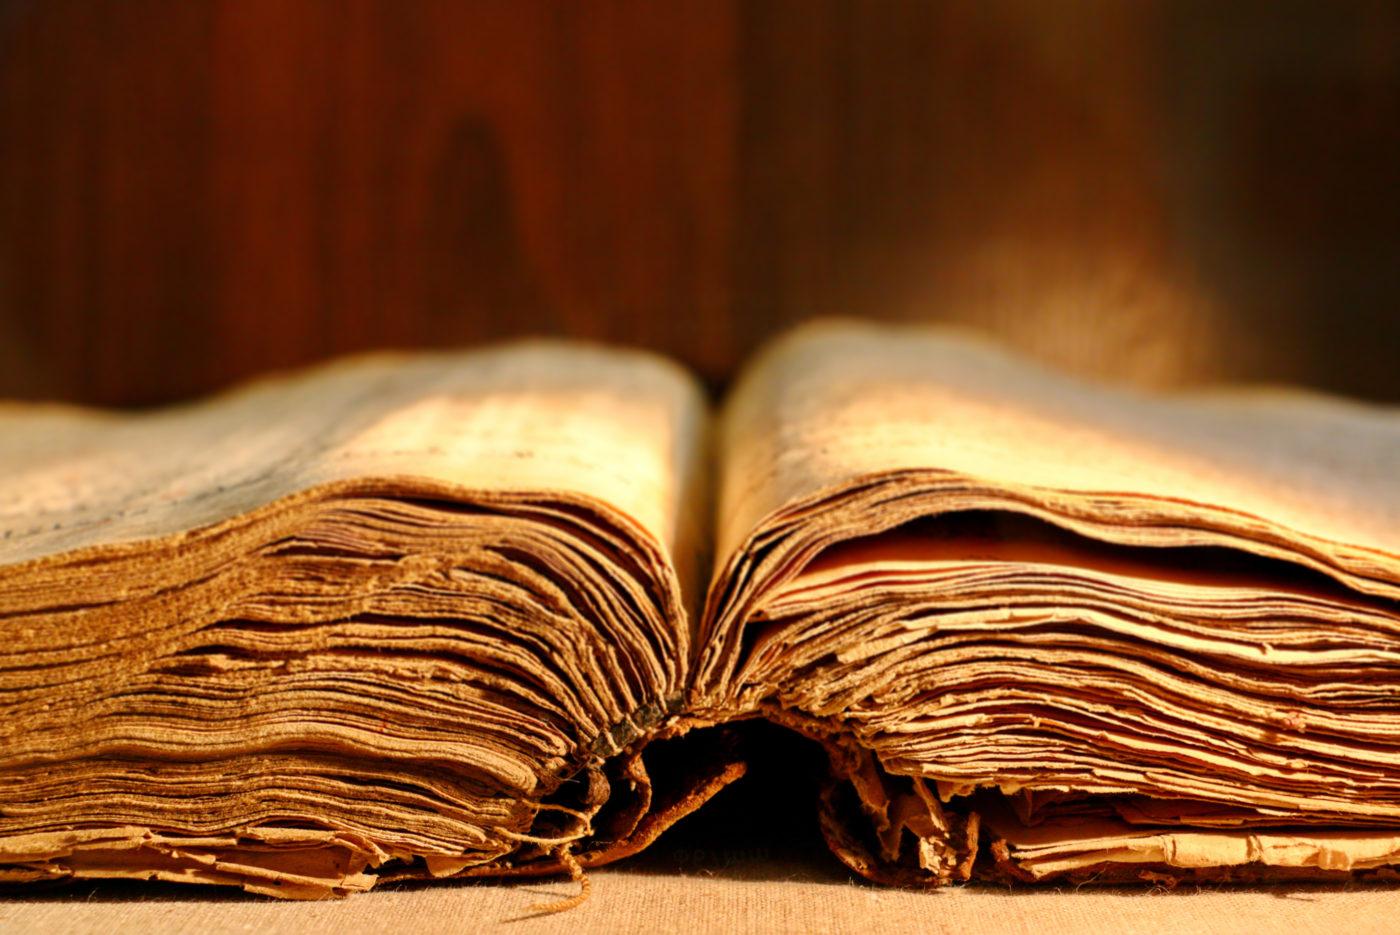 Image for Did Jesus really exist? Don't we have just untrustworthy copies of copies of copies of the Gospels?